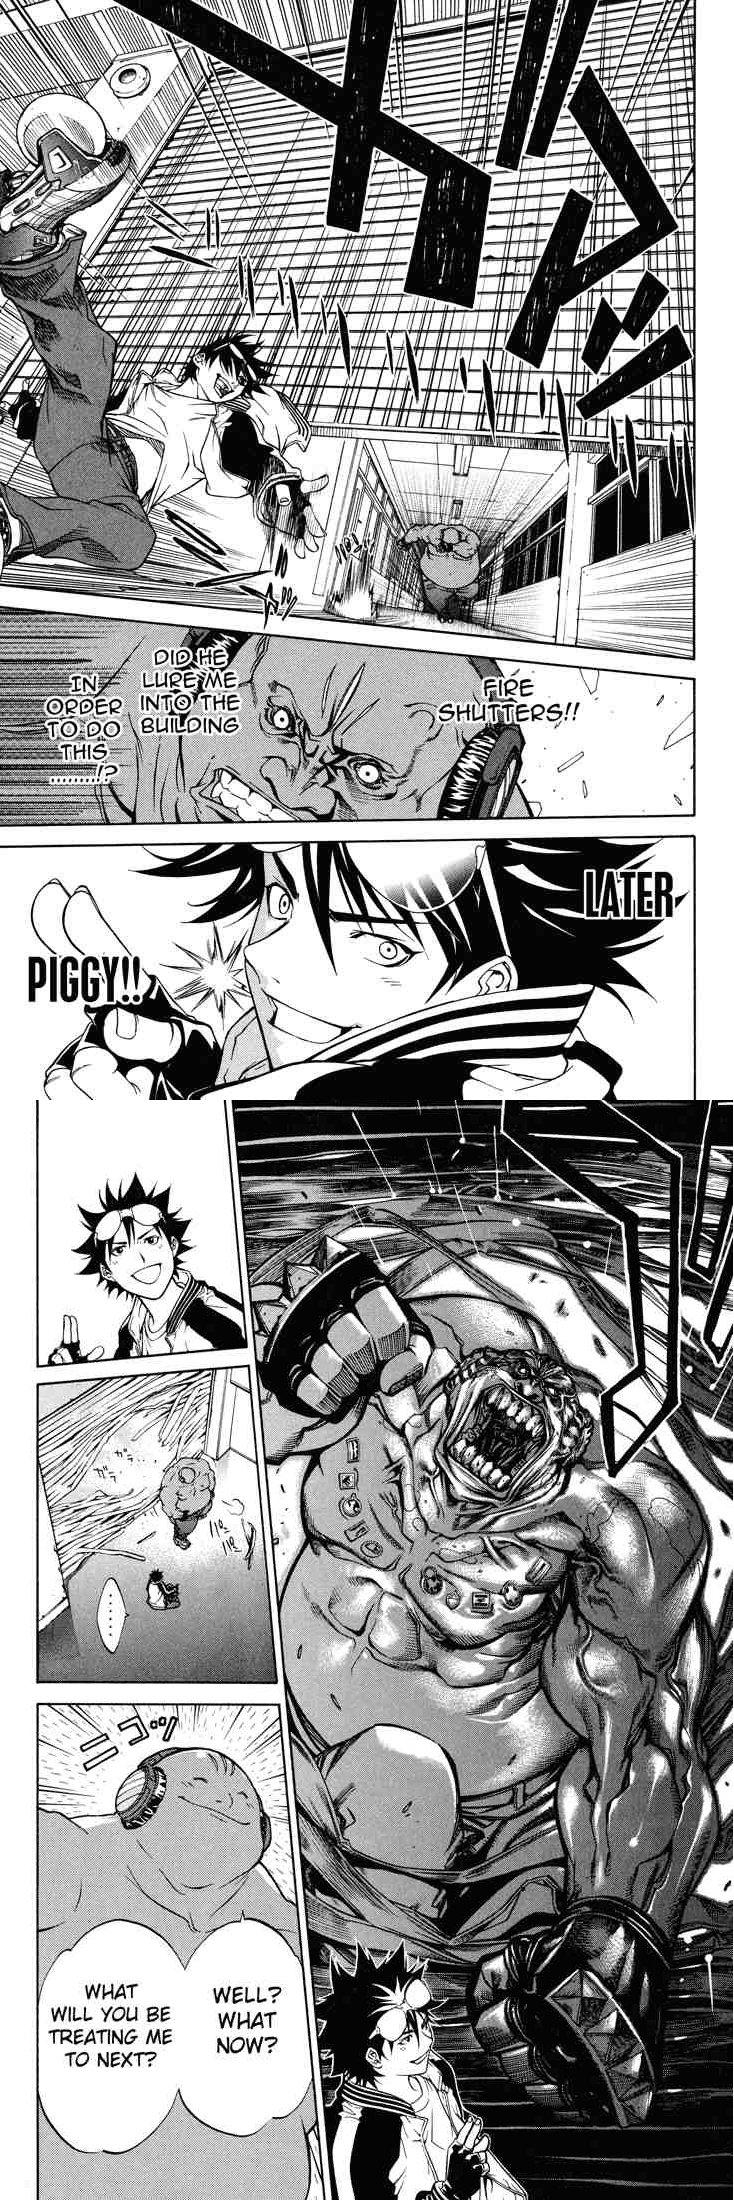 runing away form someone. manga air gear. talia rum. -m. I loved that Anime Air Gear runing away form someone manga air gear talia rum -m I loved that Anime Air Gear